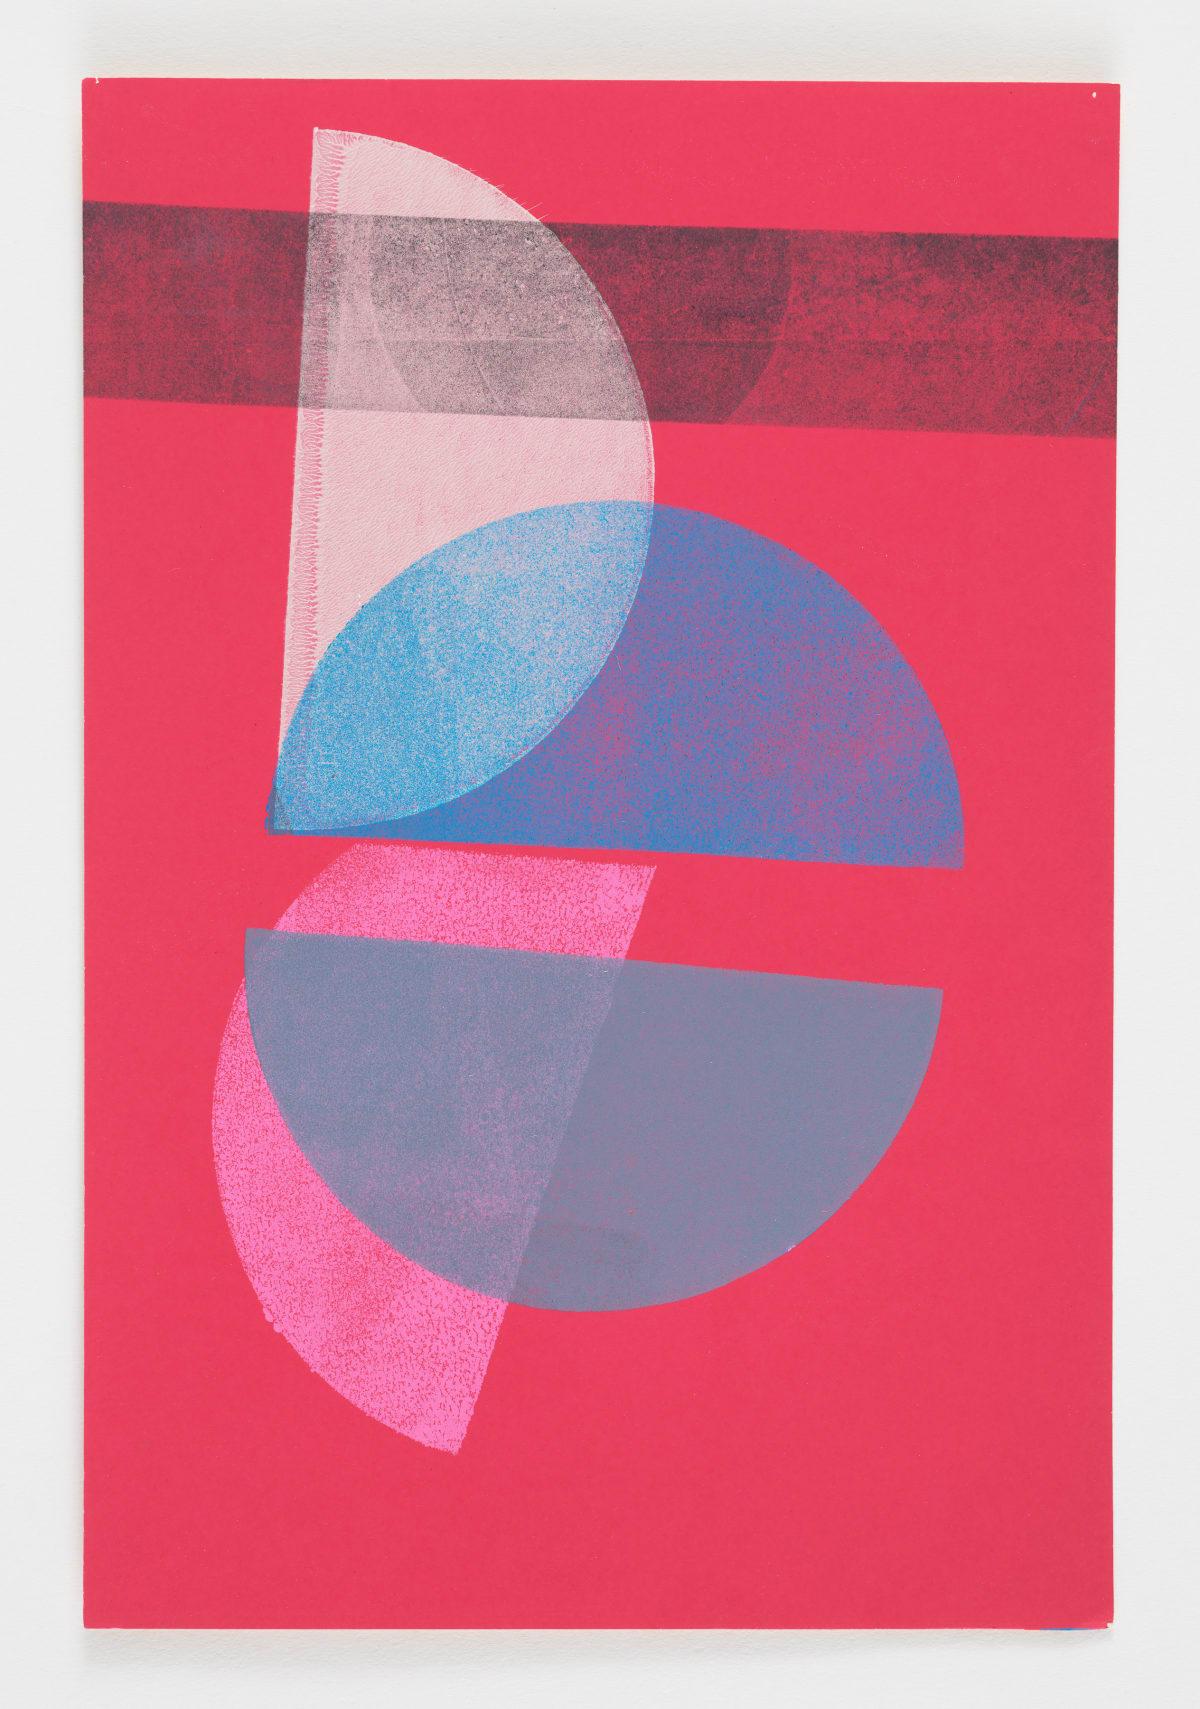 Austin Thomas, Half Circles with a Black Line, 2017